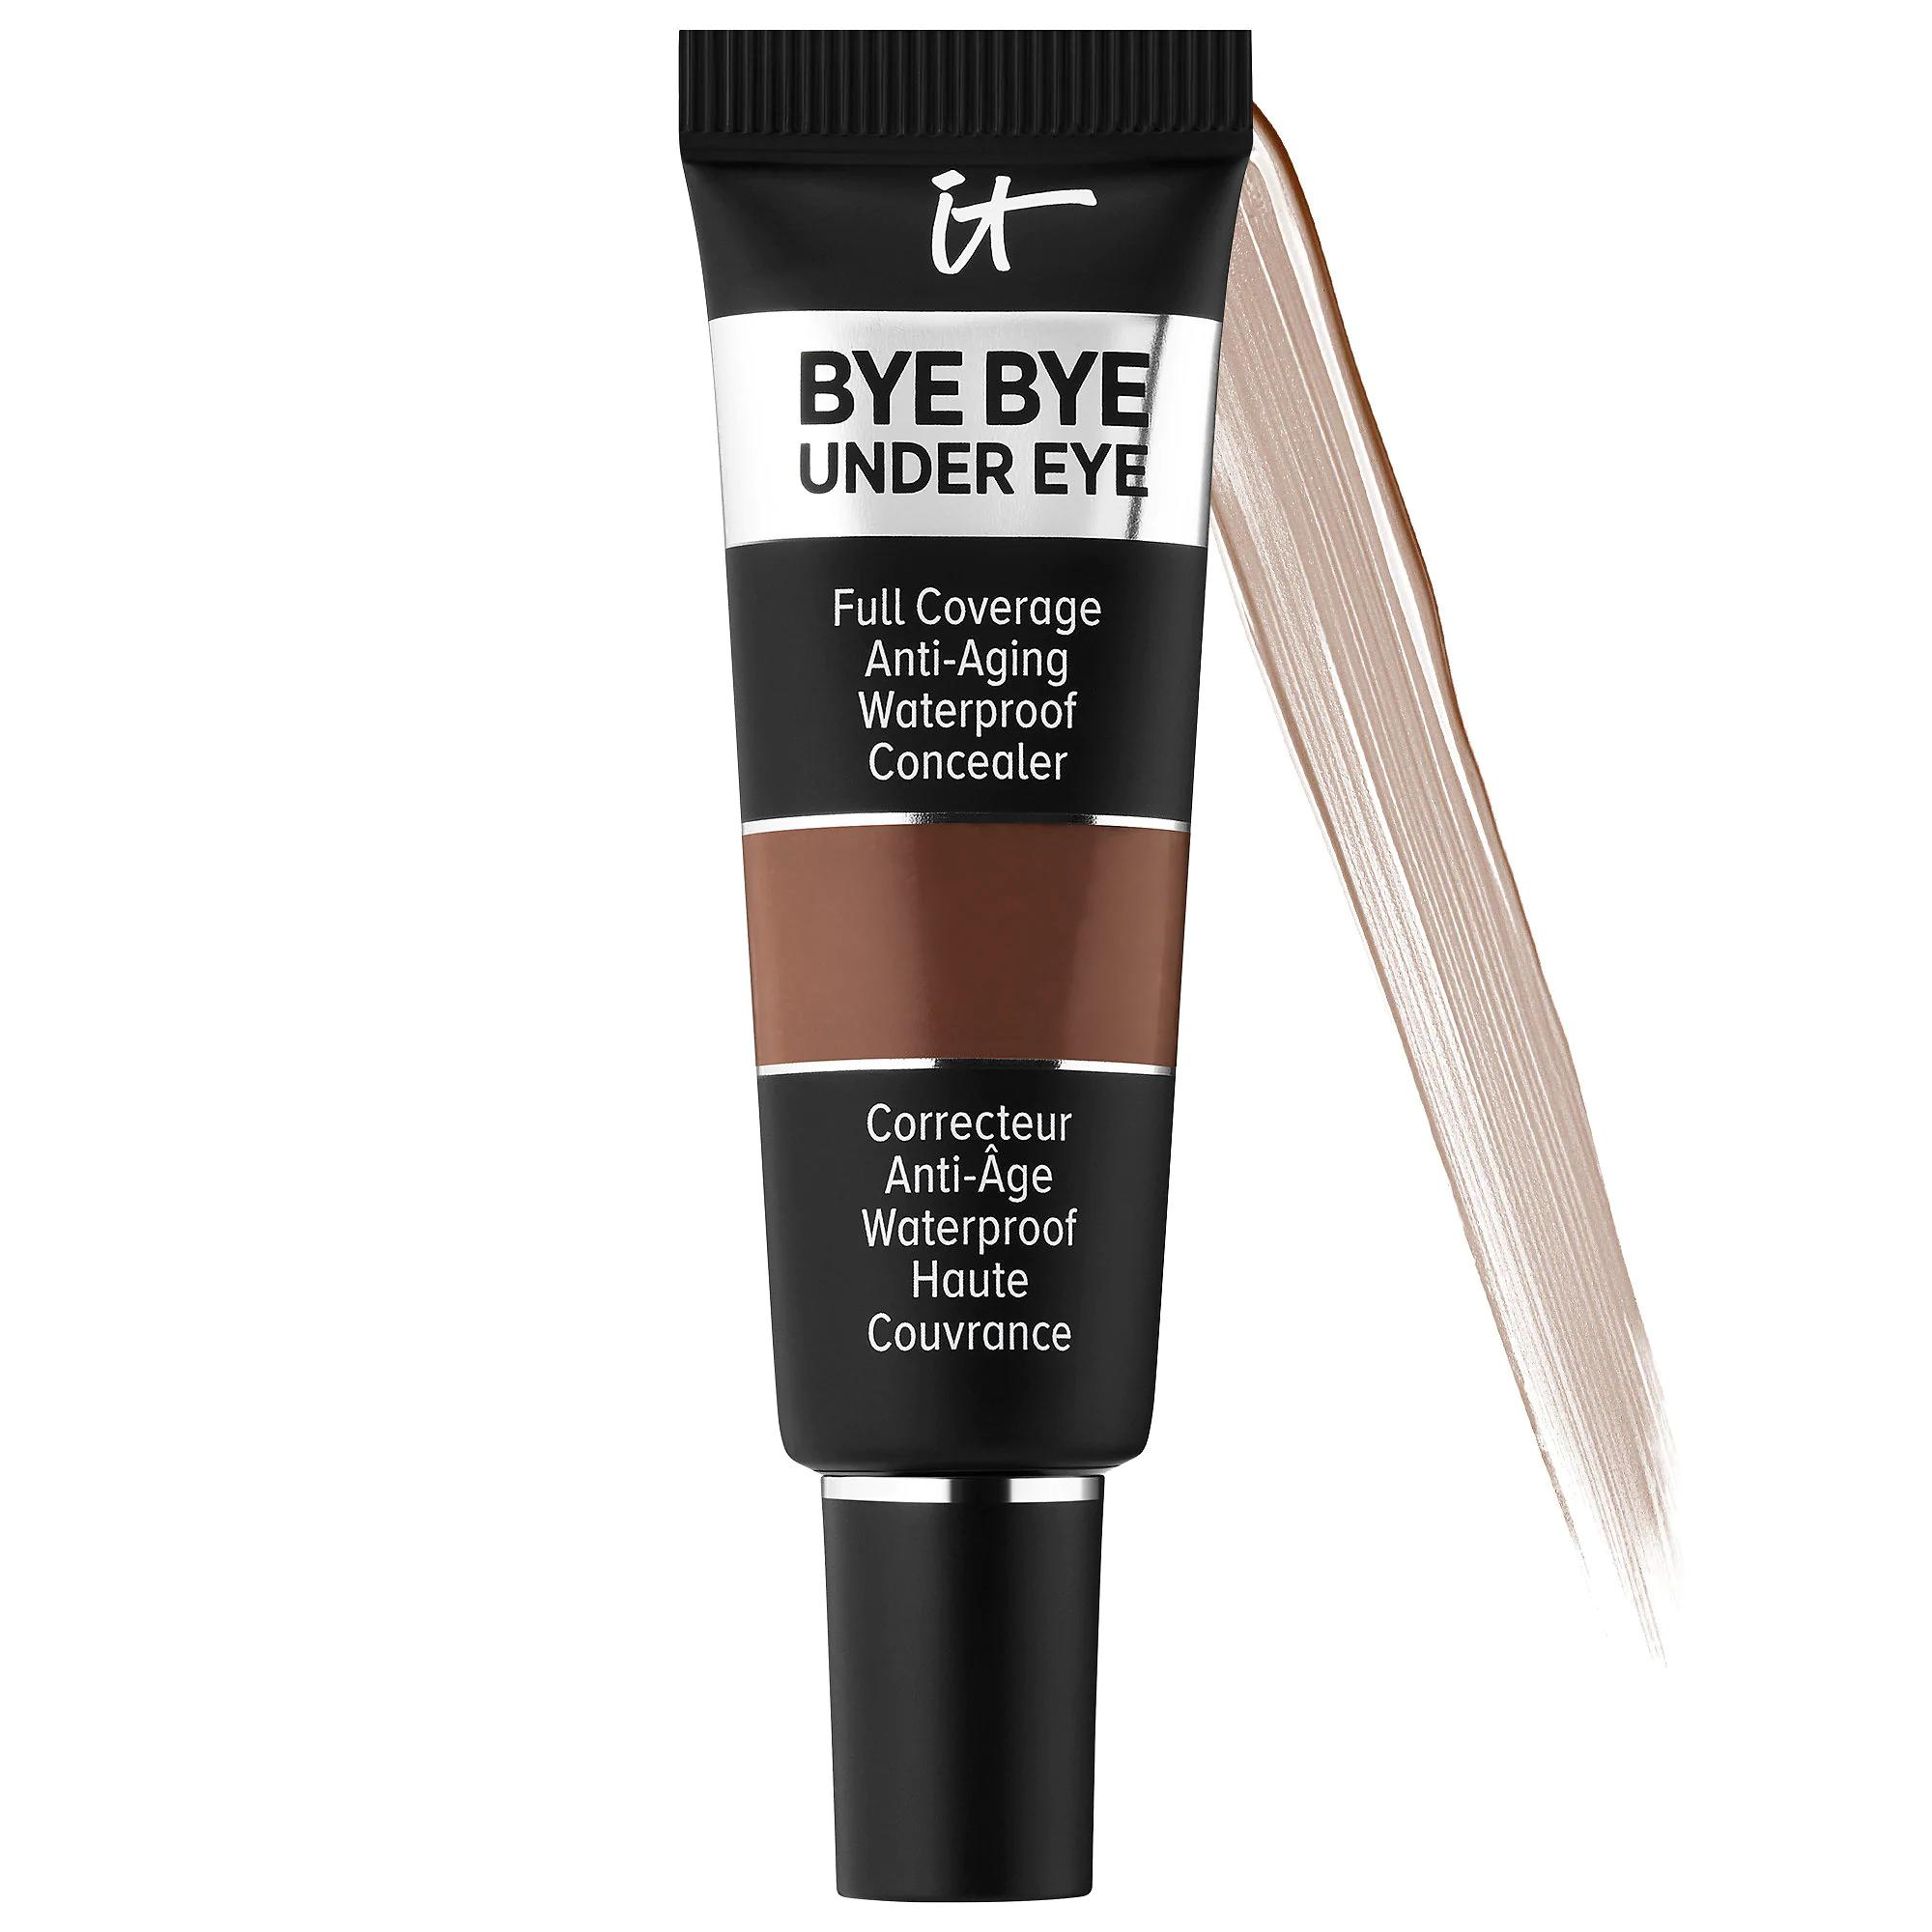 IT Cosmetics Bye Bye Under Eye Full Coverage Concealer Deep Mocha 44.5